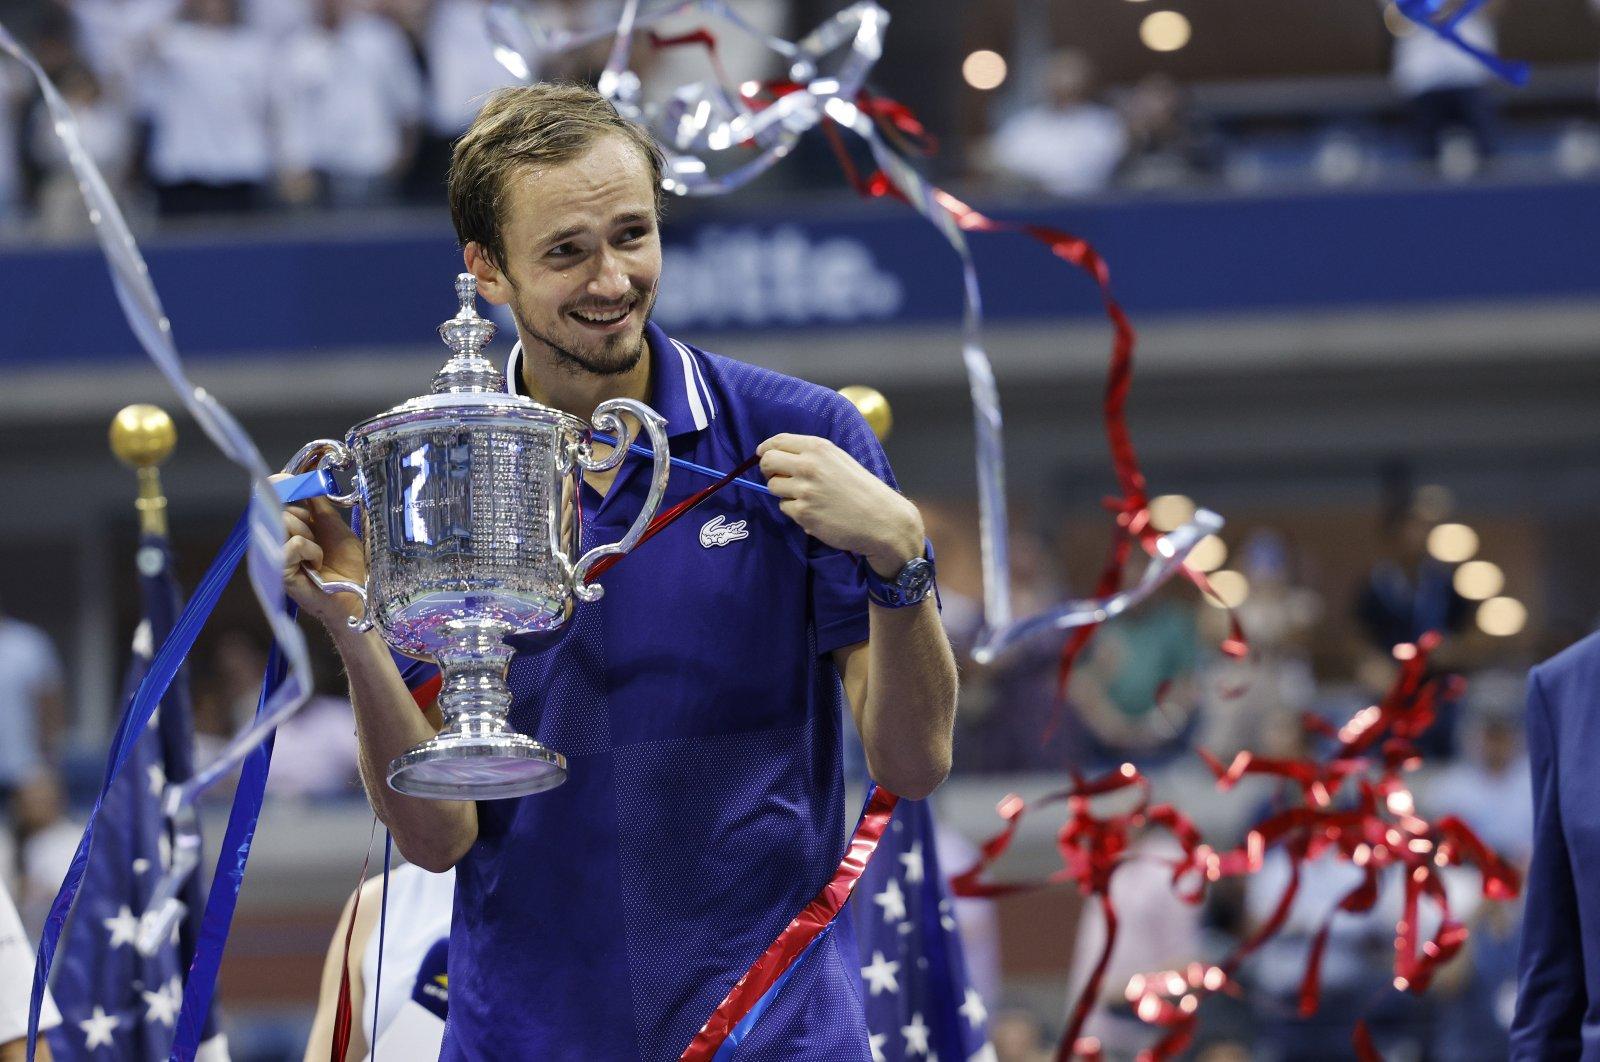 Daniil Medvedev holds up the championship trophy after defeating Novak Djokovic in the U.S. Open men's singles final, New York, U.S., Sept. 12, 2021. (EPA Photo)